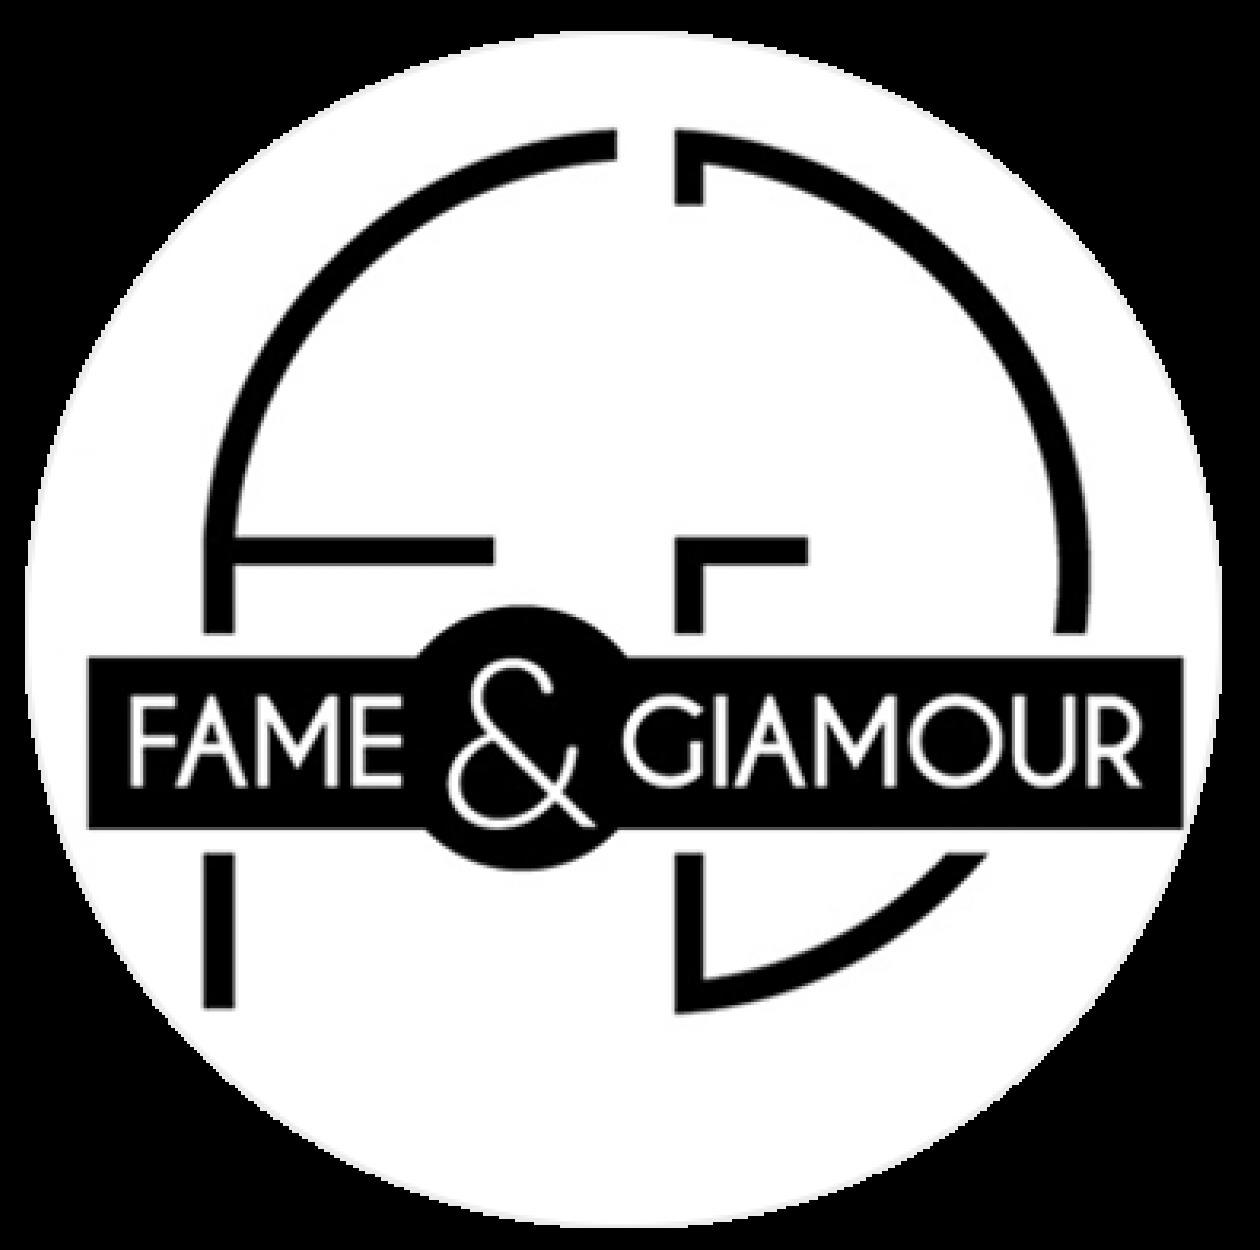 Baseball shooting stars clipart jpg download F&G shooting star knit beanie w/rainbow | Fame & Glamour jpg download